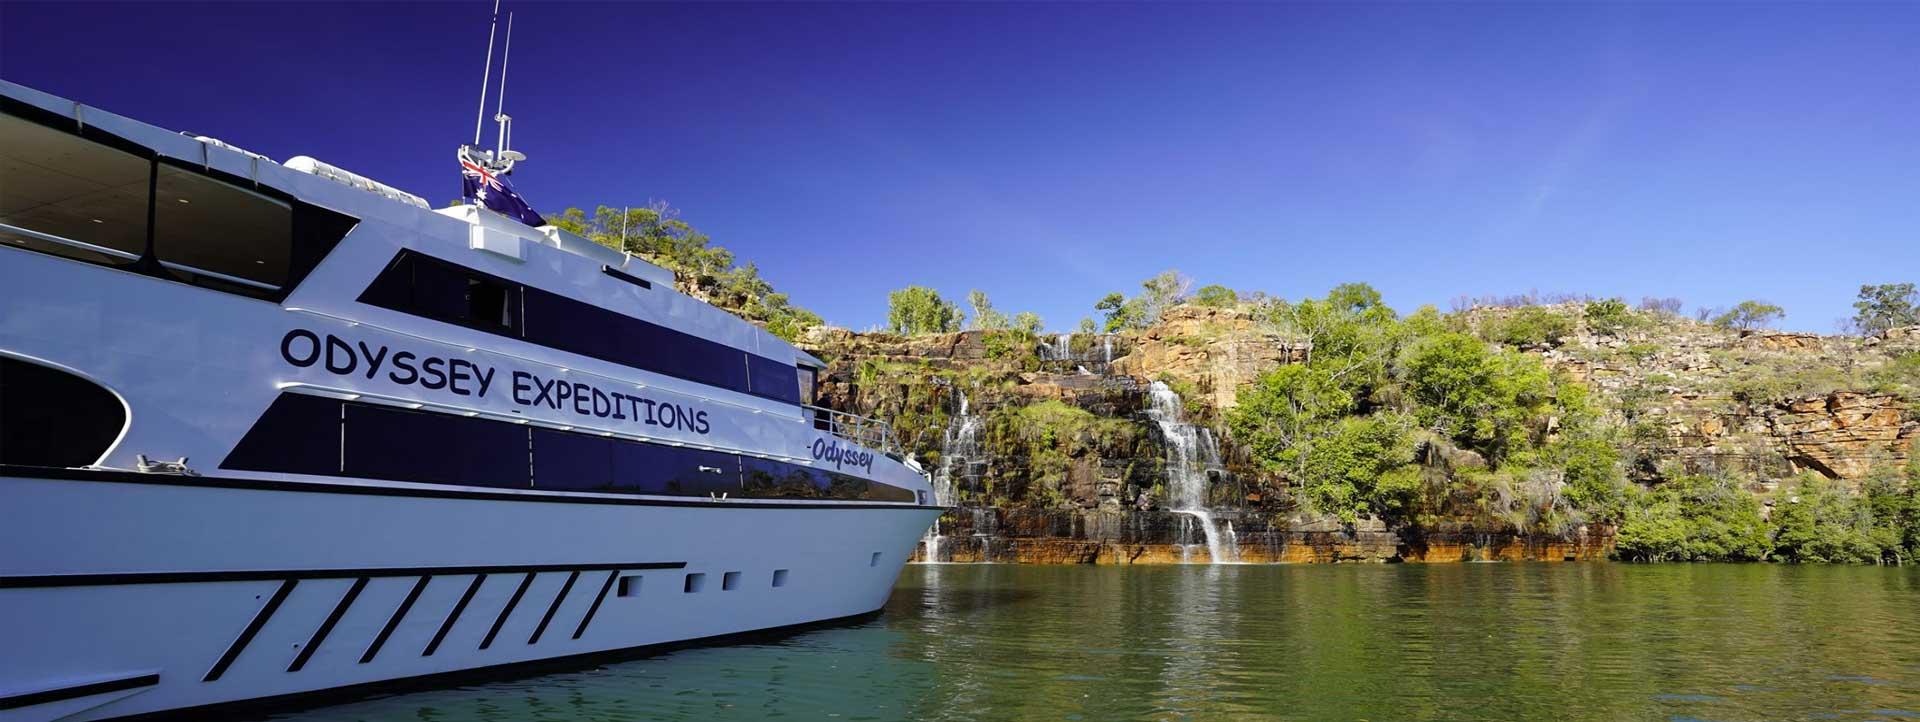 https://www.kimberleyboatcruises.com.au/wp-content/uploads/2020/08/ODYSSEY-EXPEDITIONS-side-profile-Kings-Cascades.jpg